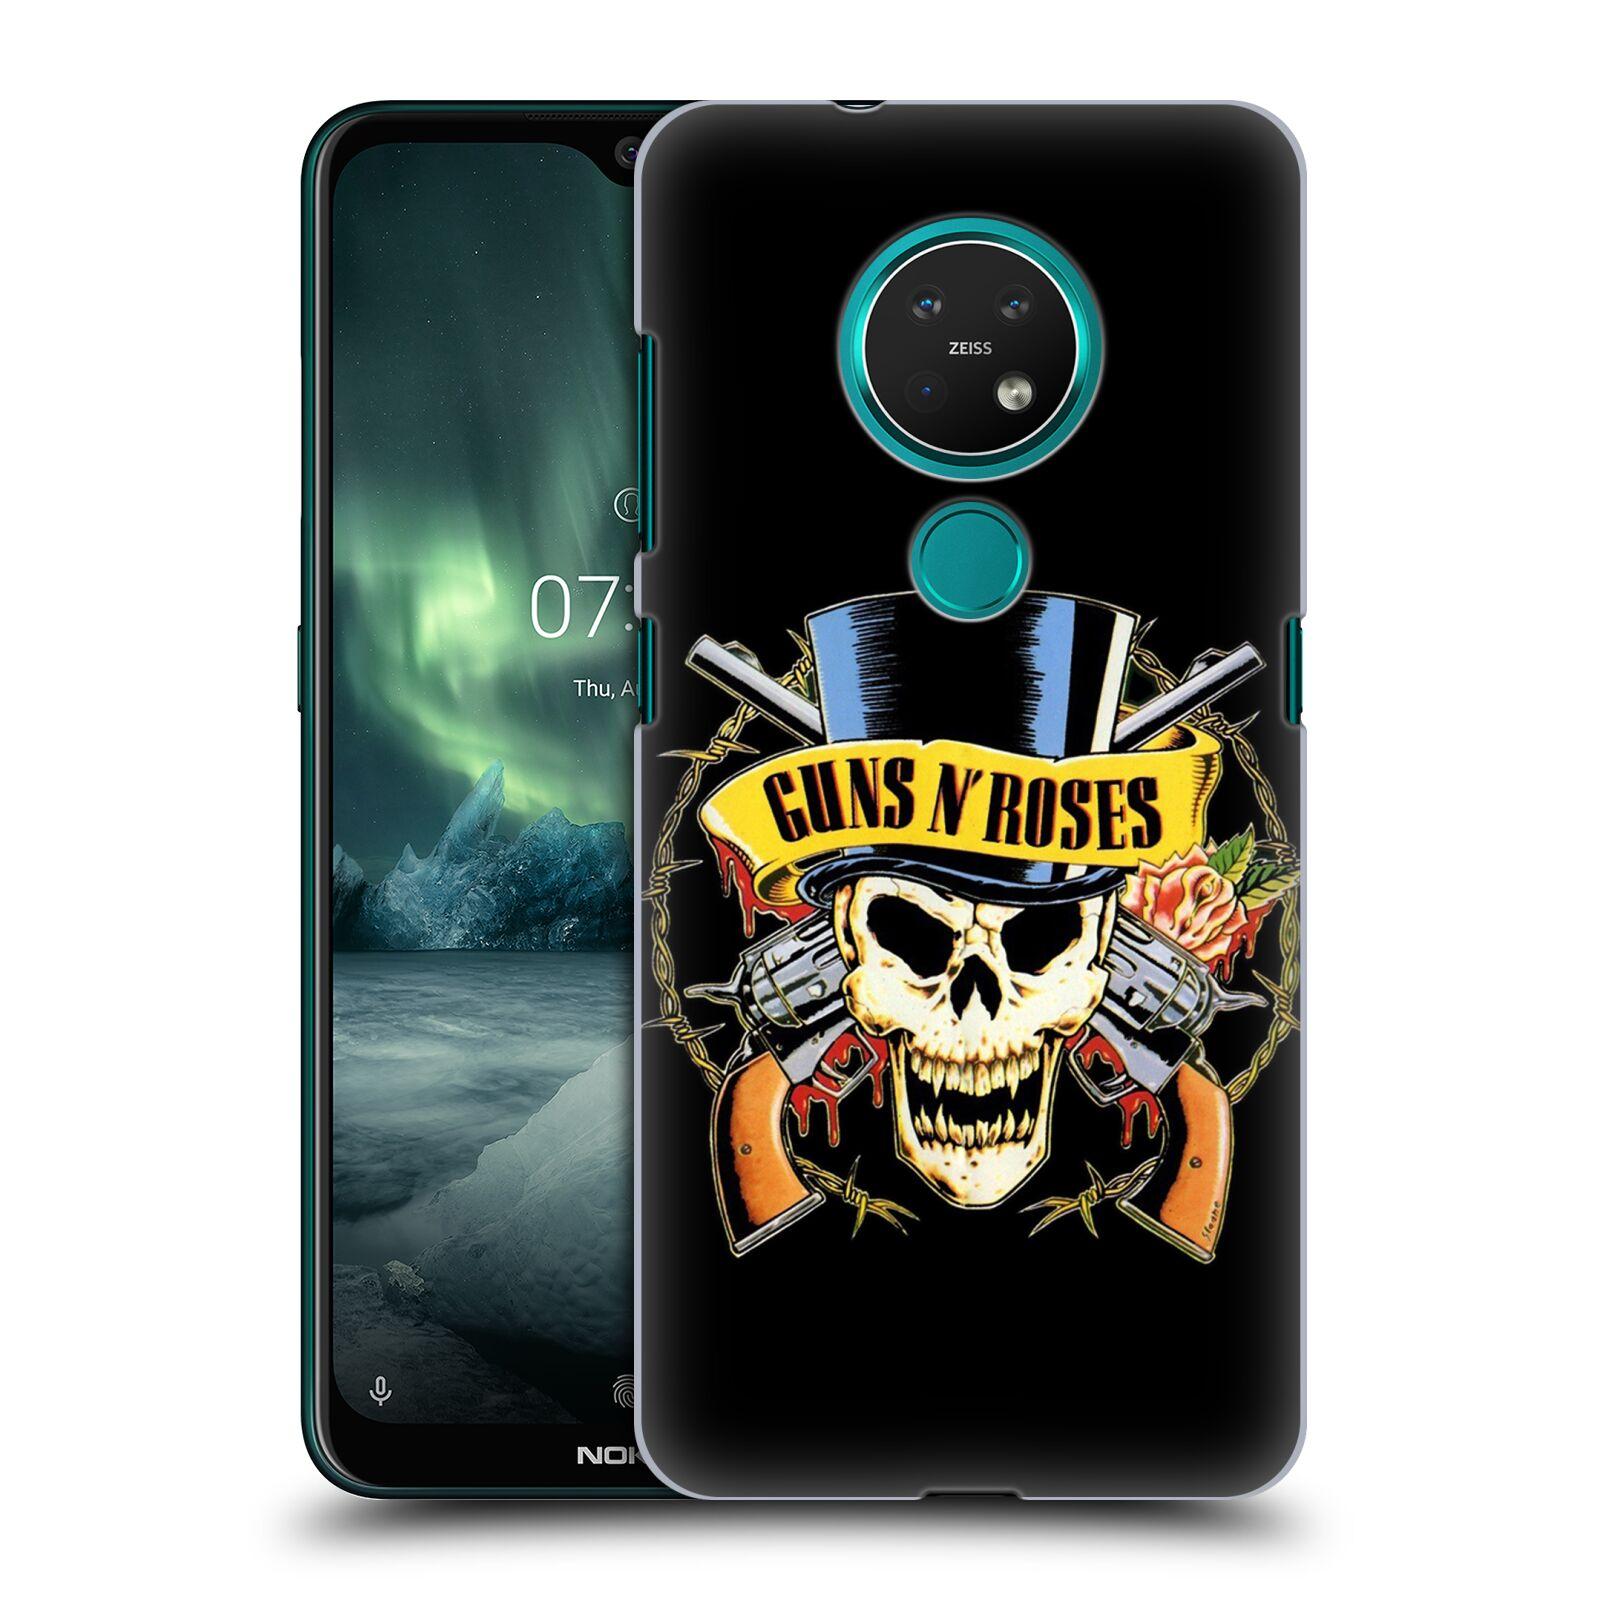 Plastové pouzdro na mobil Nokia 7.2 - Head Case - Guns N' Roses - Lebka